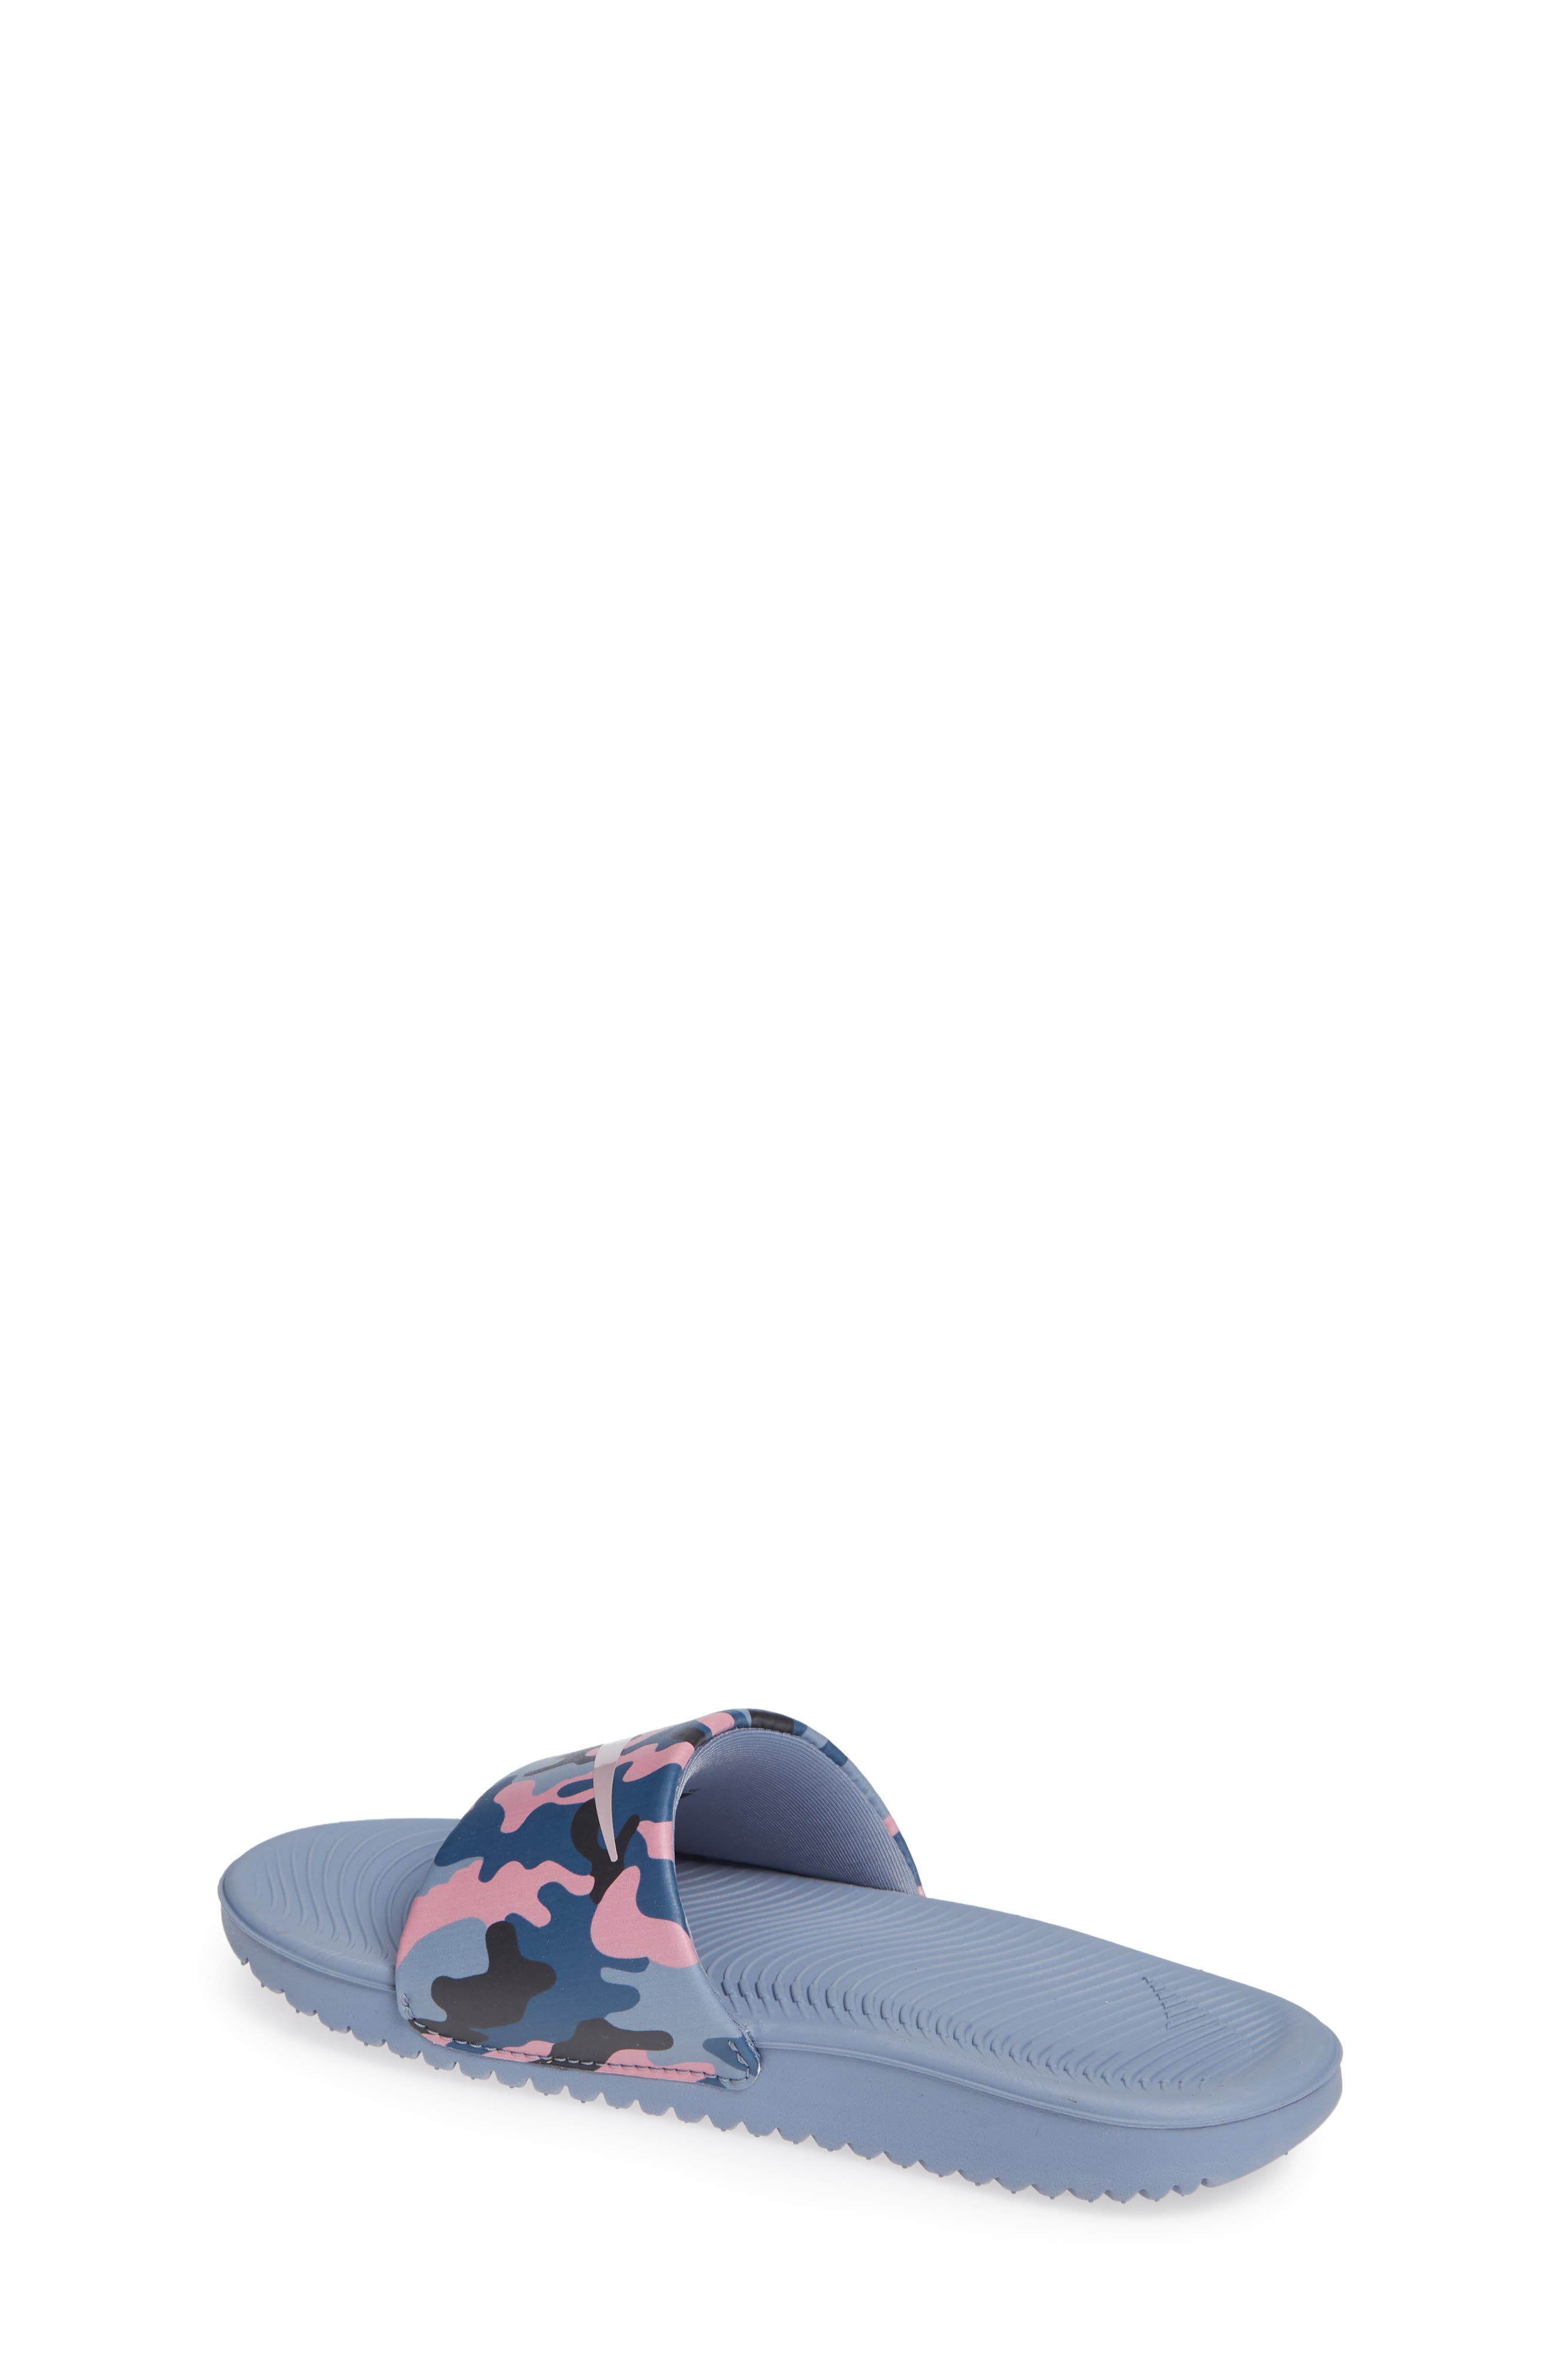 Kawa Slide Sandal,                             Alternate thumbnail 2, color,                             SLATE/ ROSE/ DIFFUSED BLUE